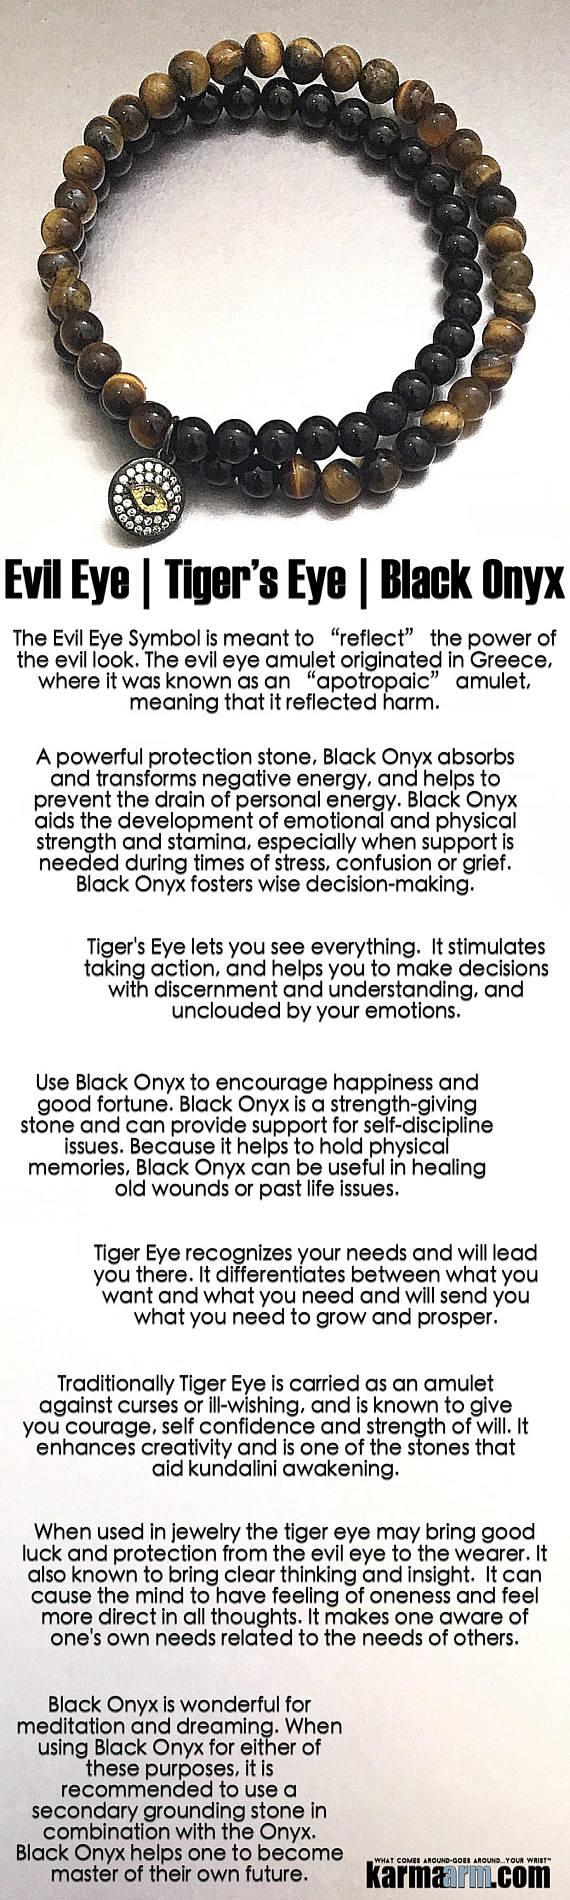 Protection black onyx tiger eye evil eye yoga beaded charm protection black onyx tiger eye evil eye yoga beaded charm bracelet chakra energy healing mala reiki meditation stretch jewelry buycottarizona